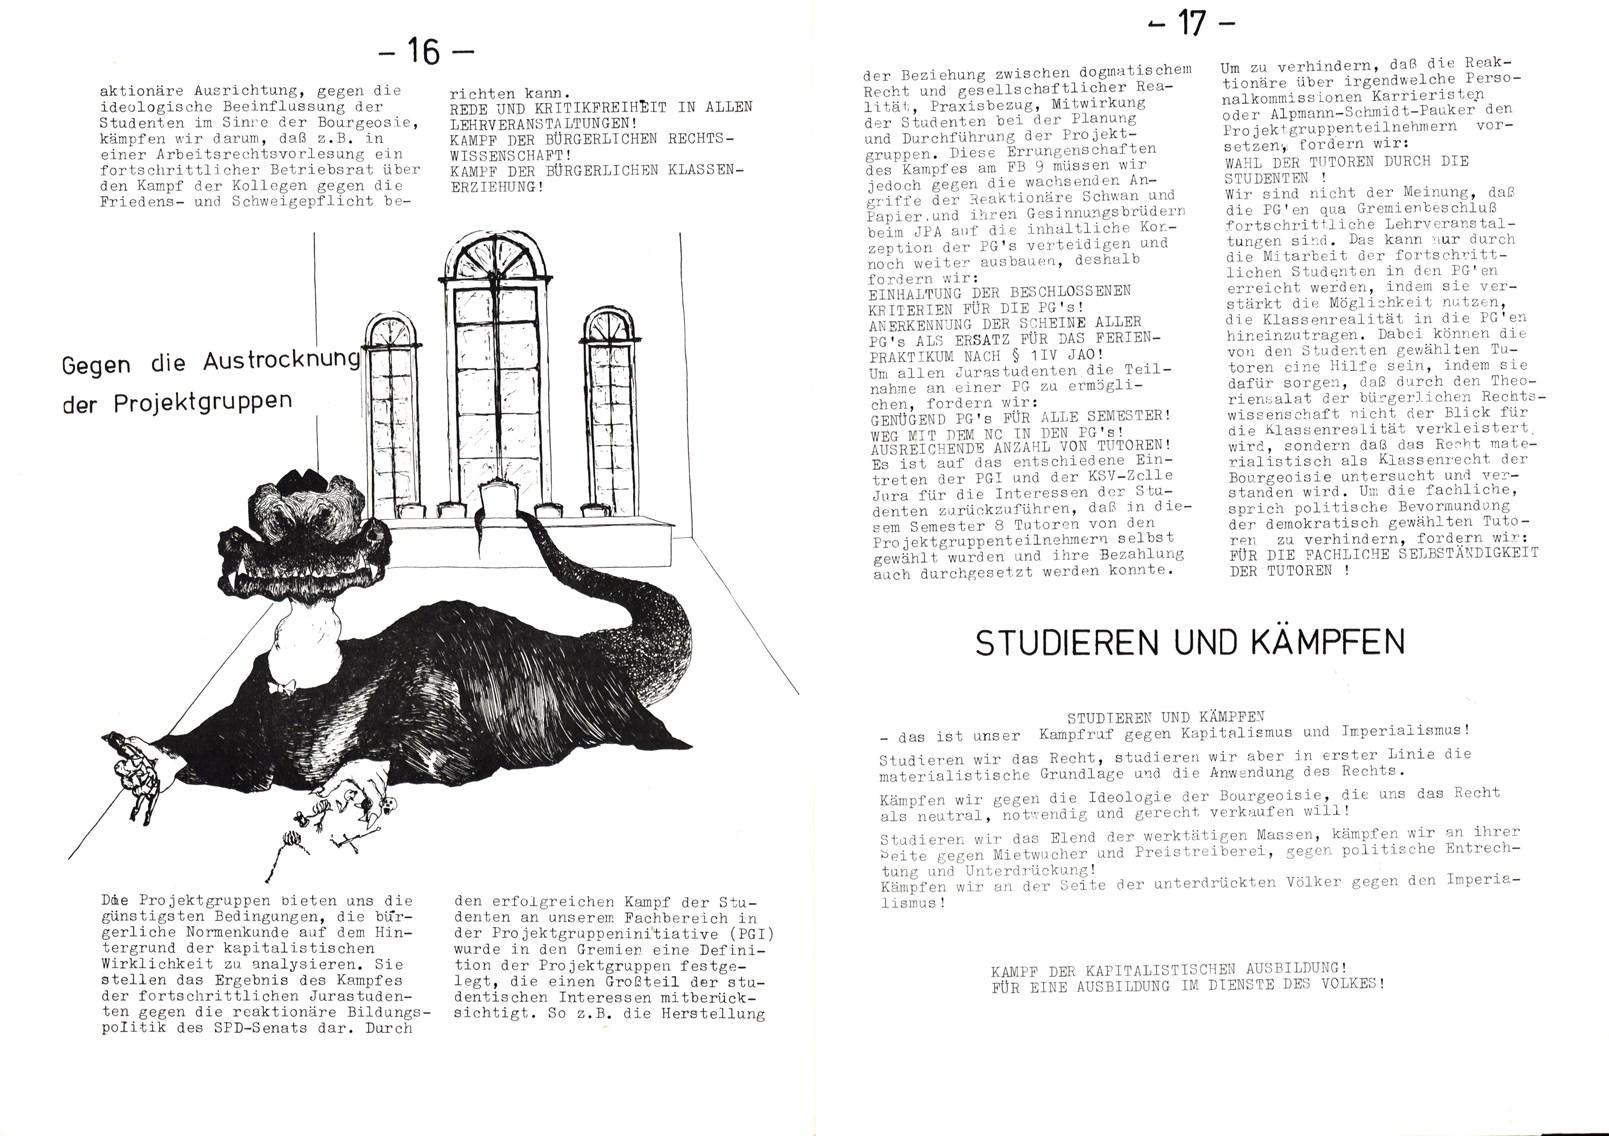 Berlin_KSV_Jura_Studentenpresse_19730600_20_09